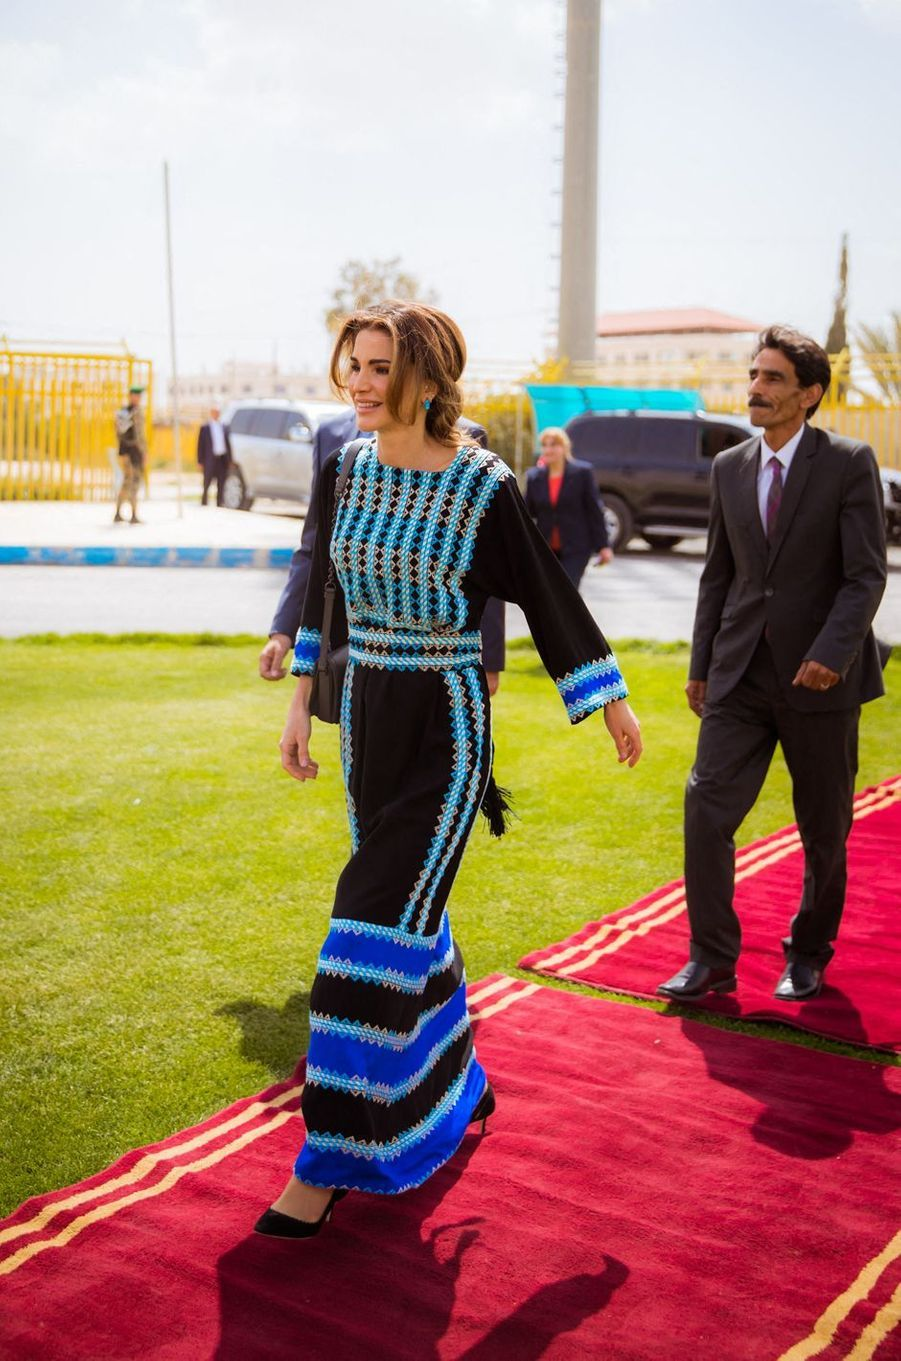 La reine Rania de Jordanie, dans une robe de style traditionnel, à Al Mafraq le 8 avril 2019